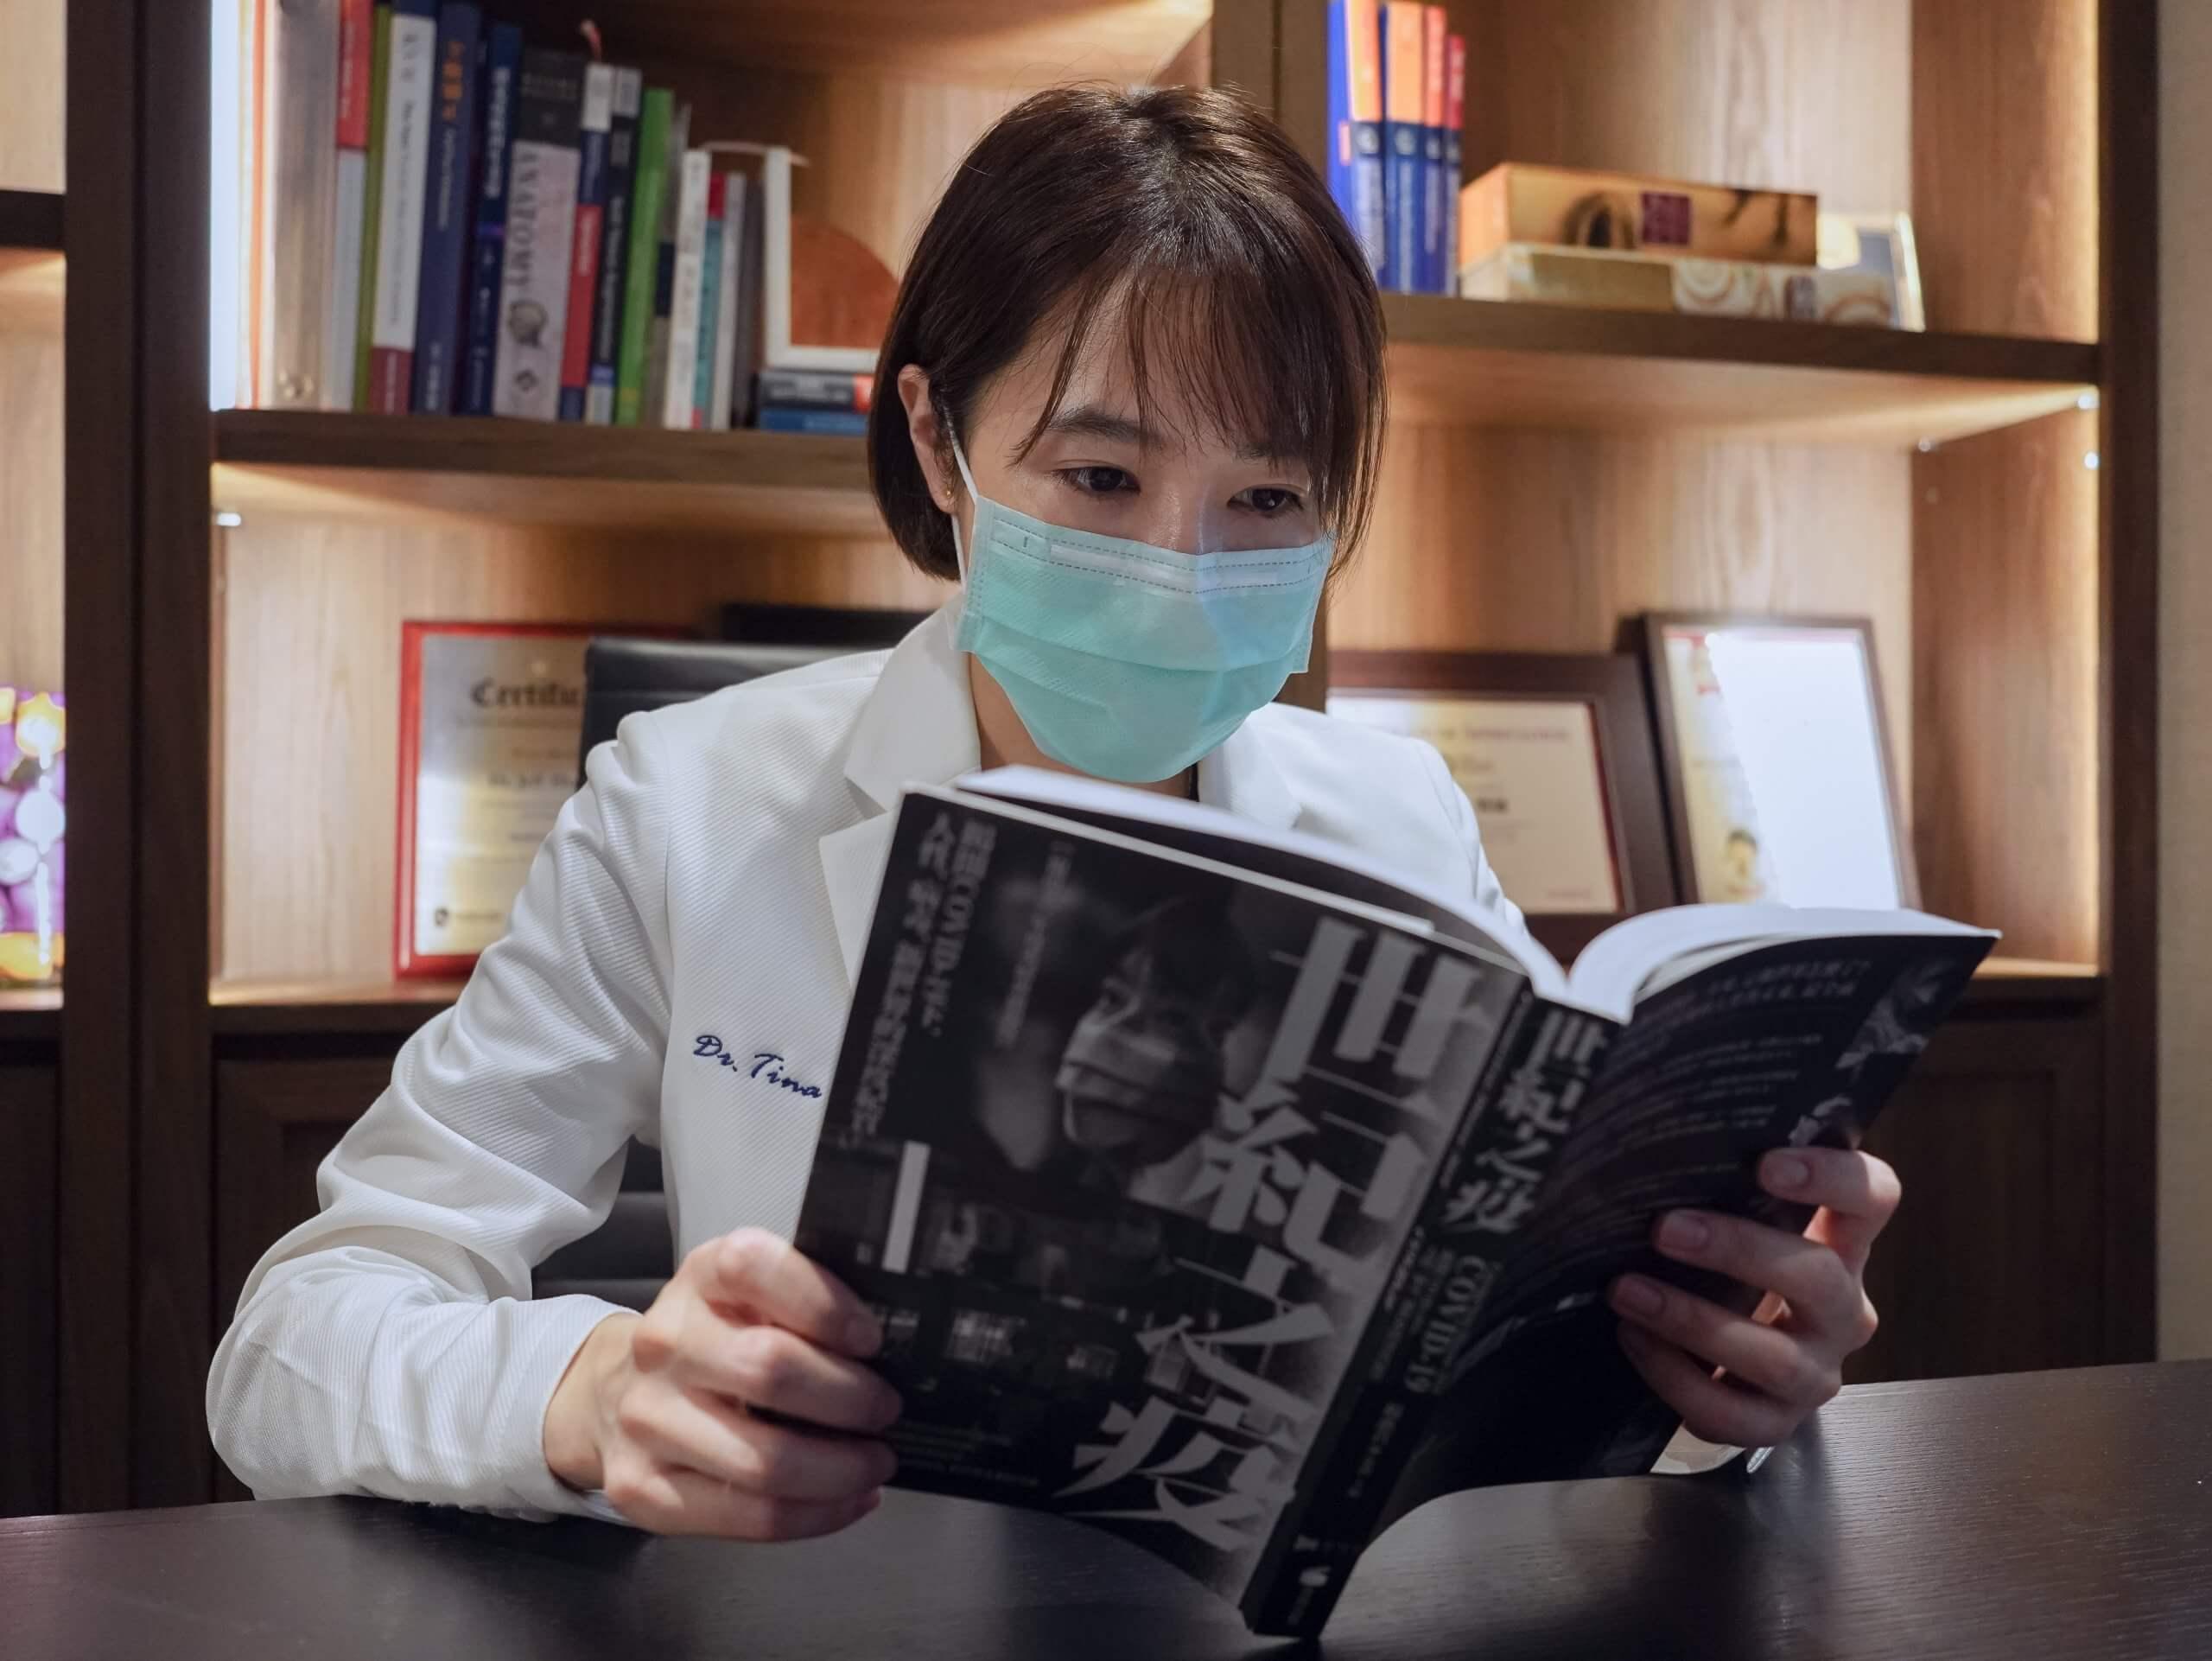 Read more about the article 夏至來臨,為身材超前部署!